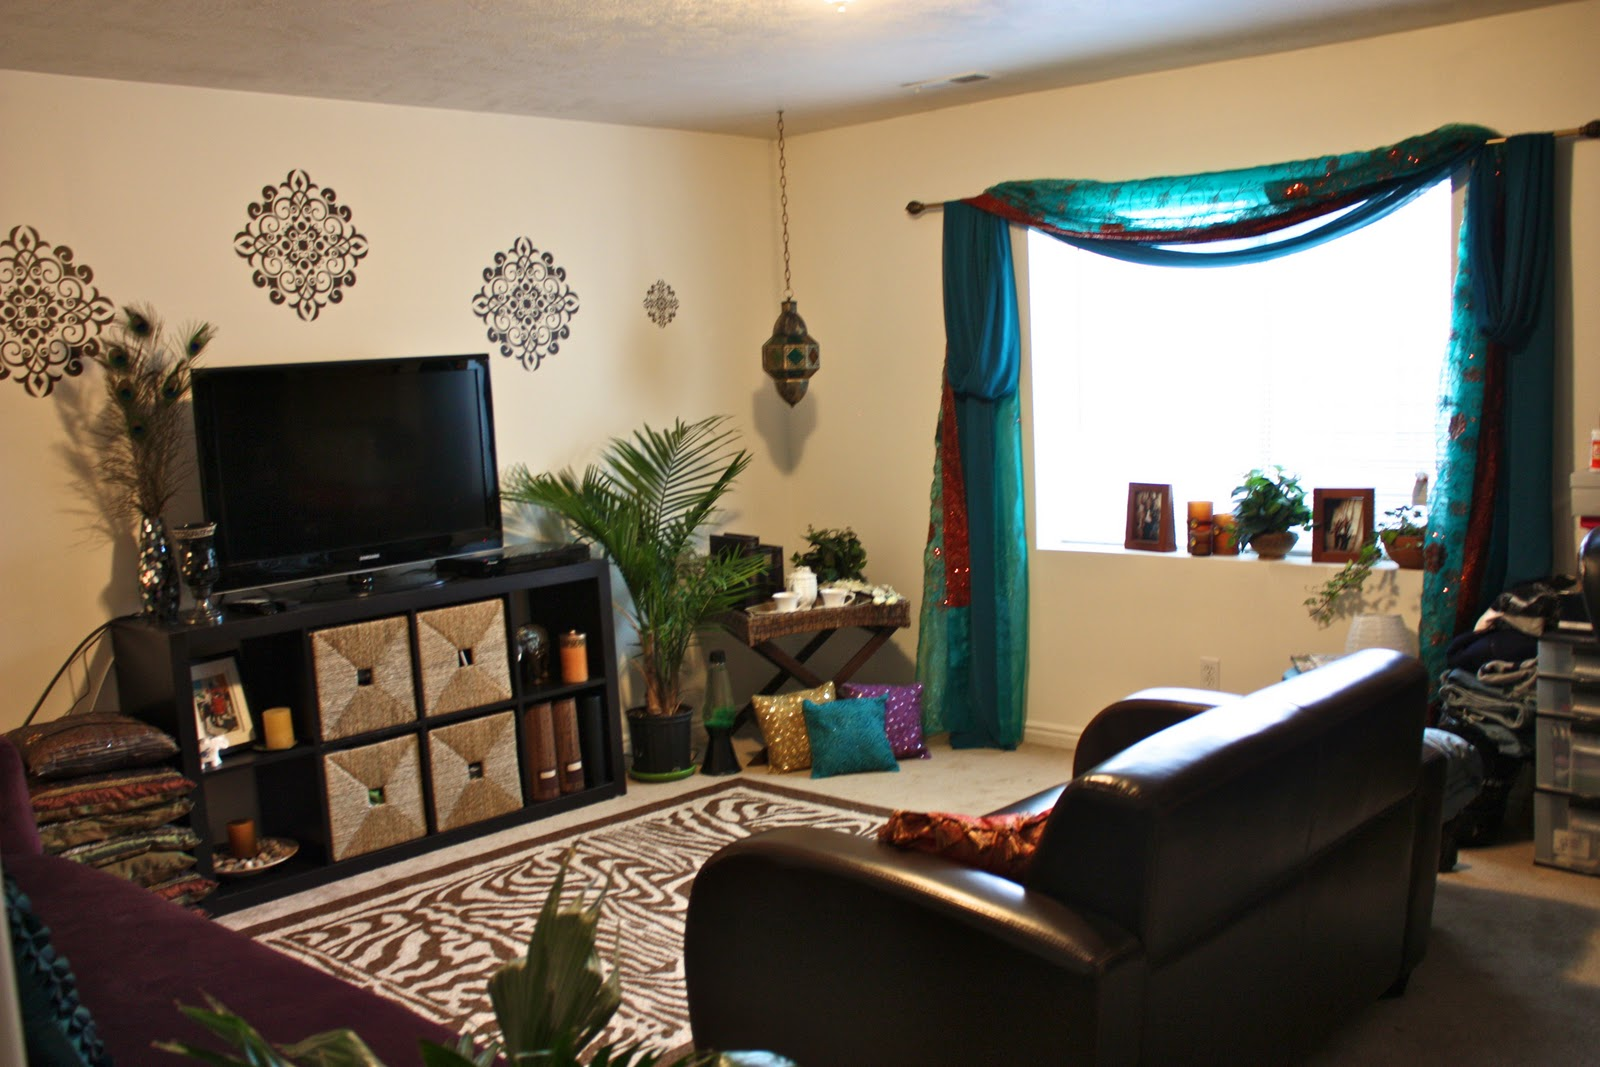 Indian living room decoration - Interior Decoration Ideas Indian Styleeasynaturalcom Living Room Decor Indiahouse Decor